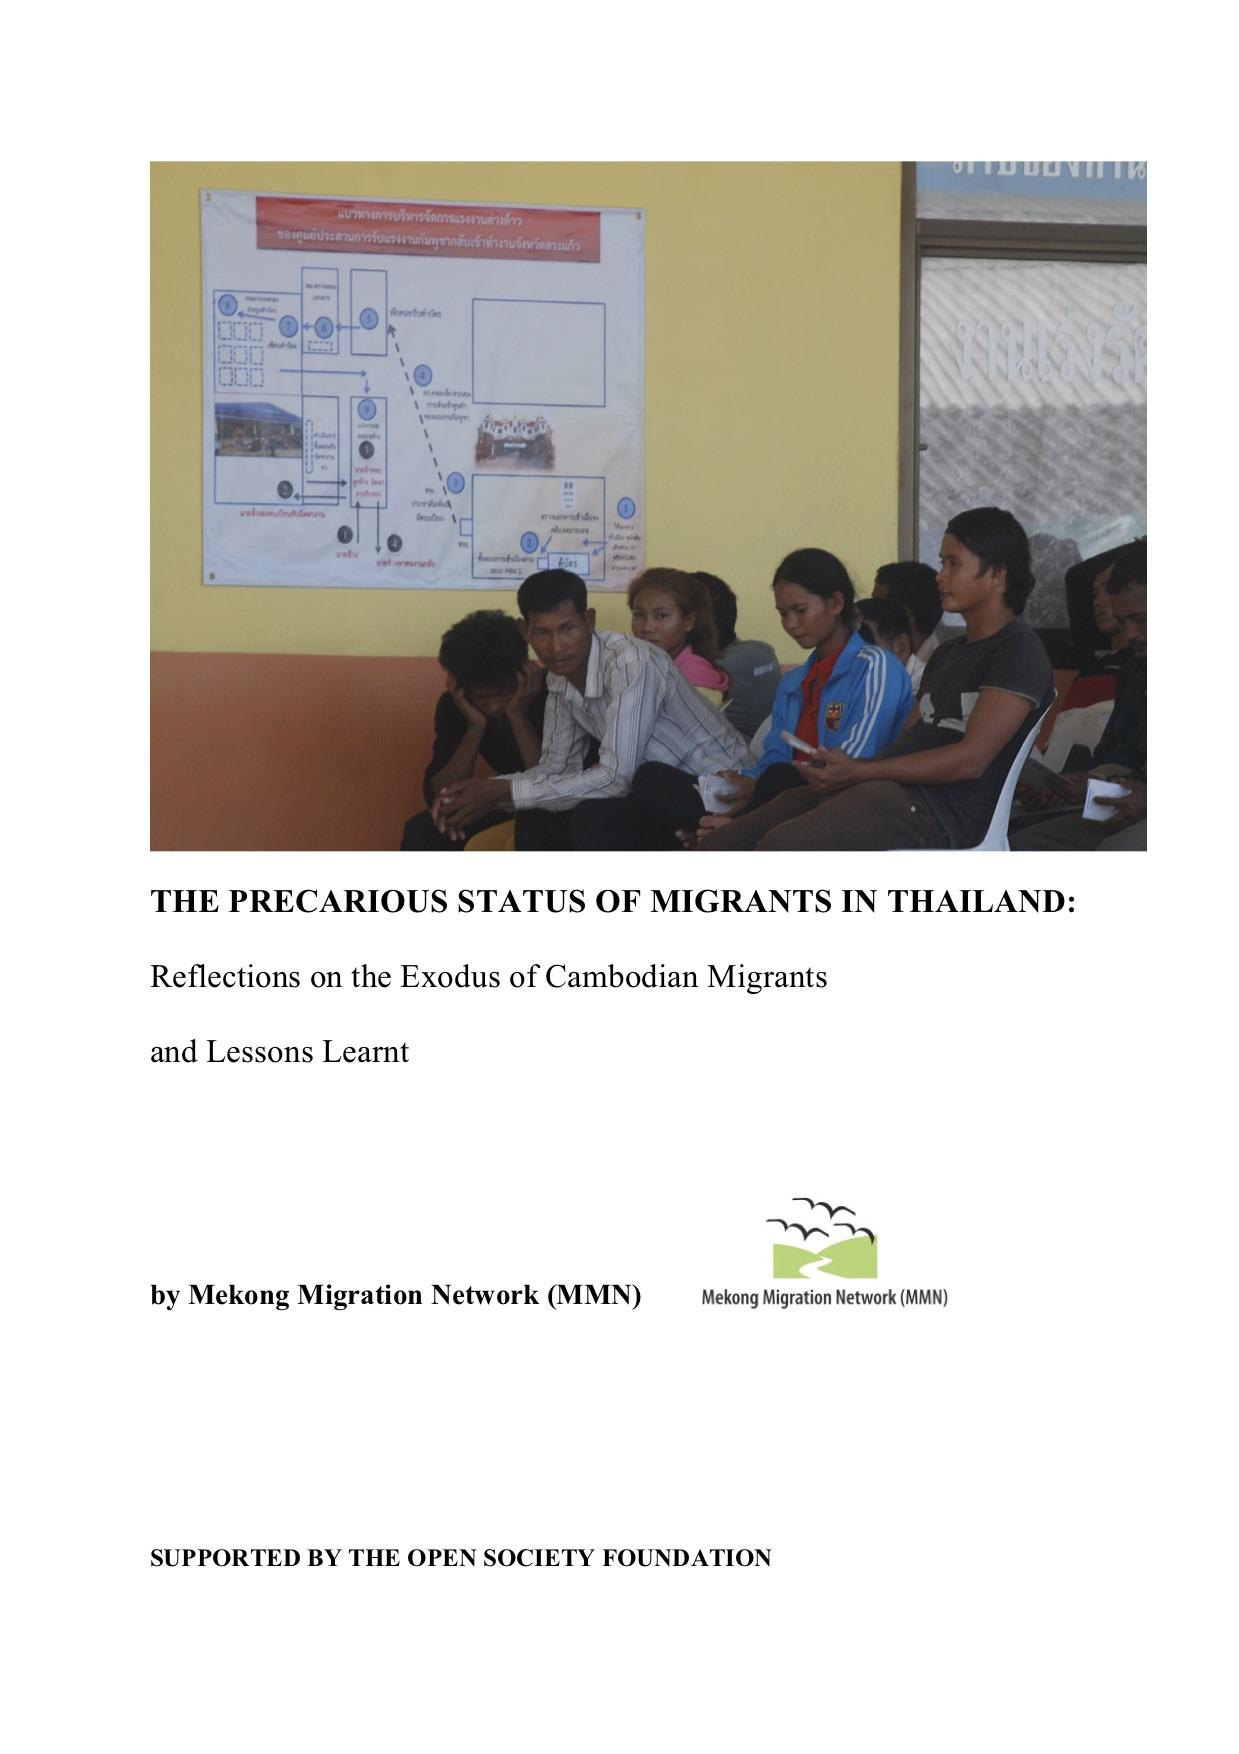 FINAL-REPORT-The-precarious-status-of-migrants-in-Thailand